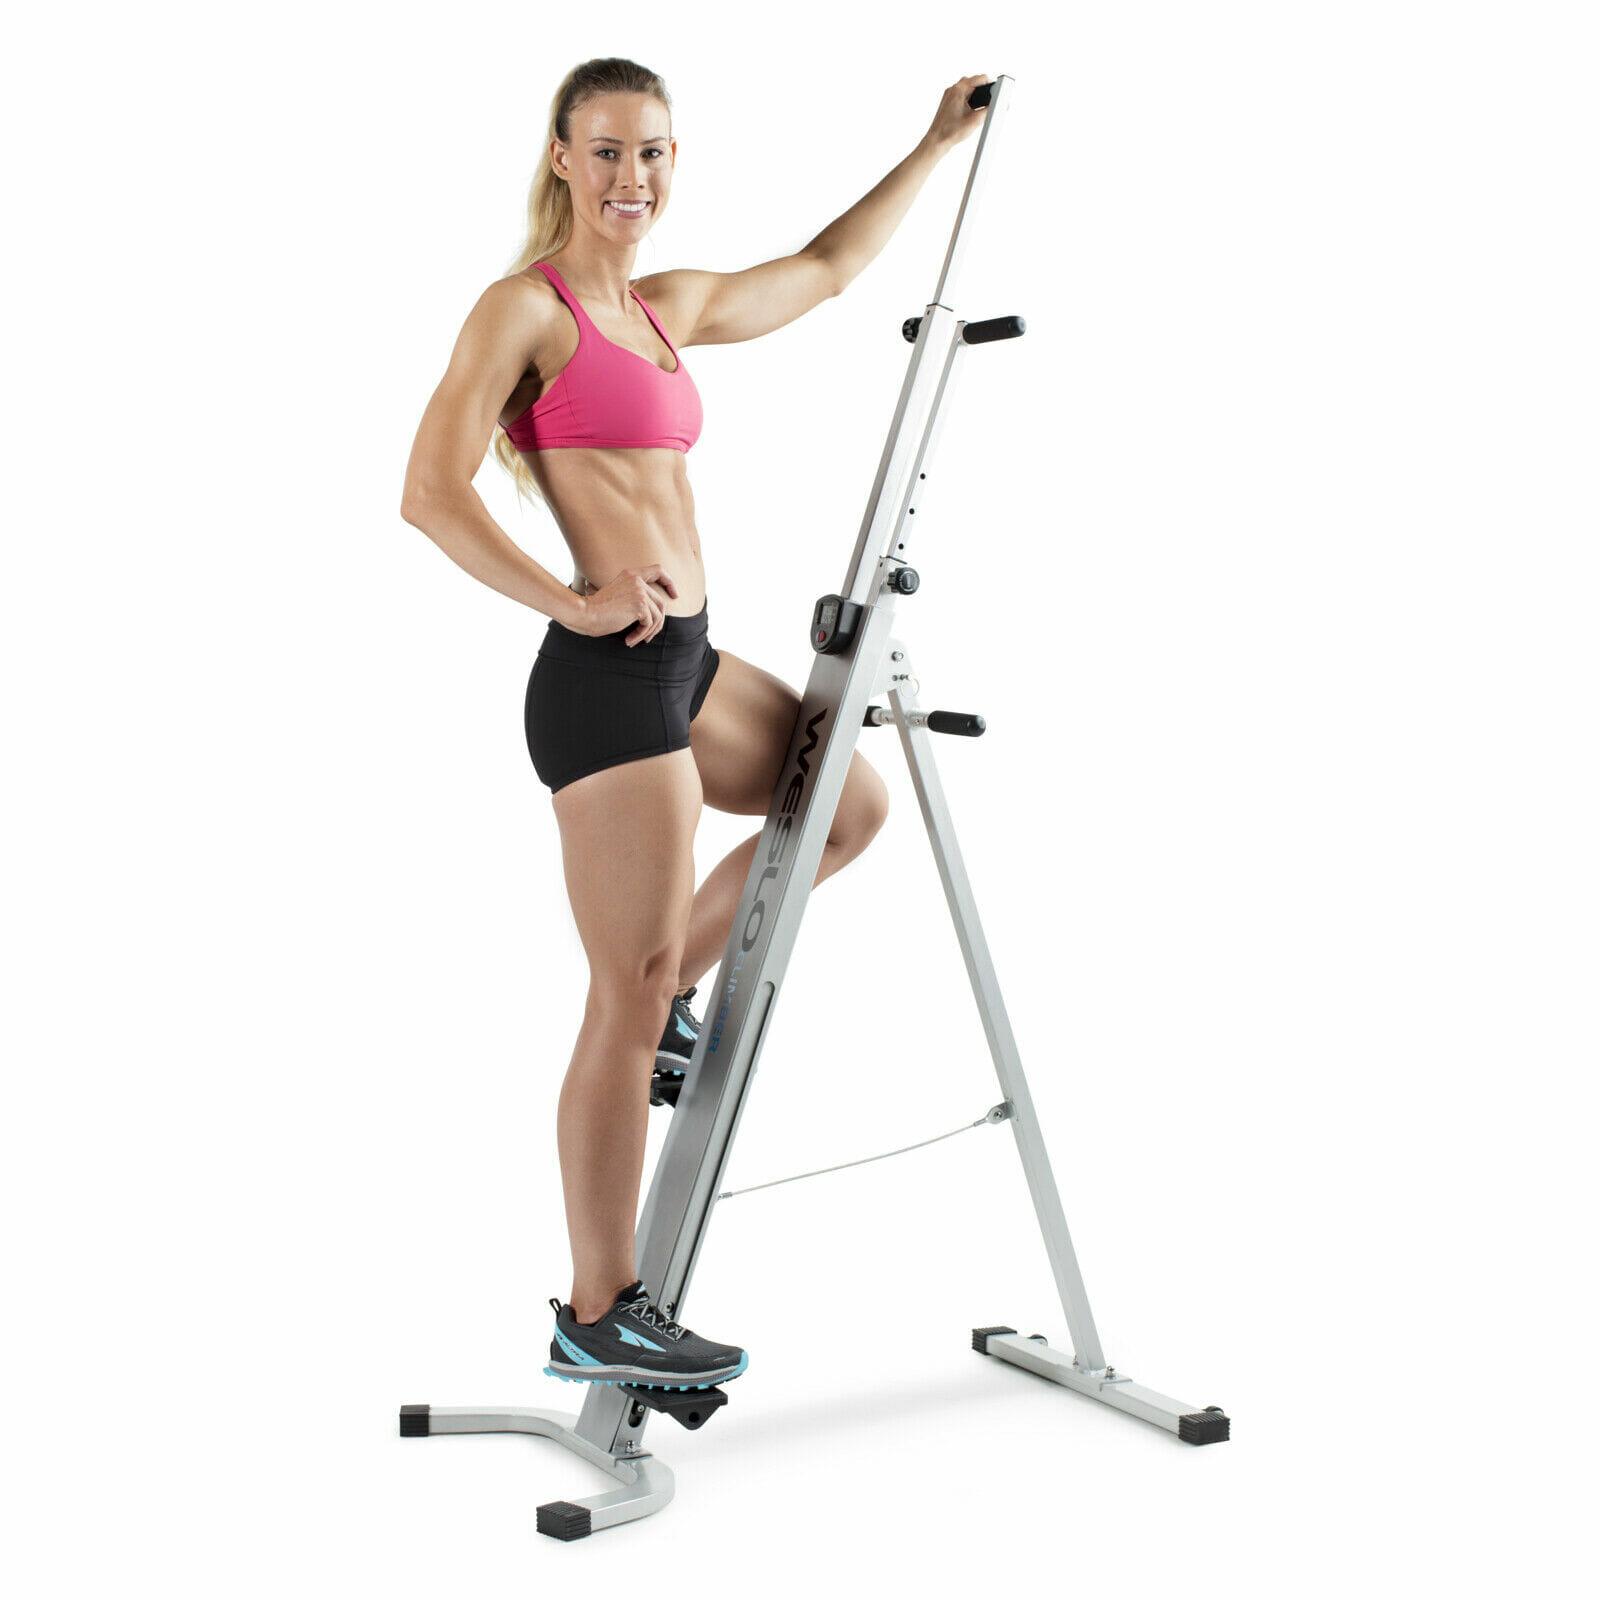 Weslo Climber - Aerobic exercise